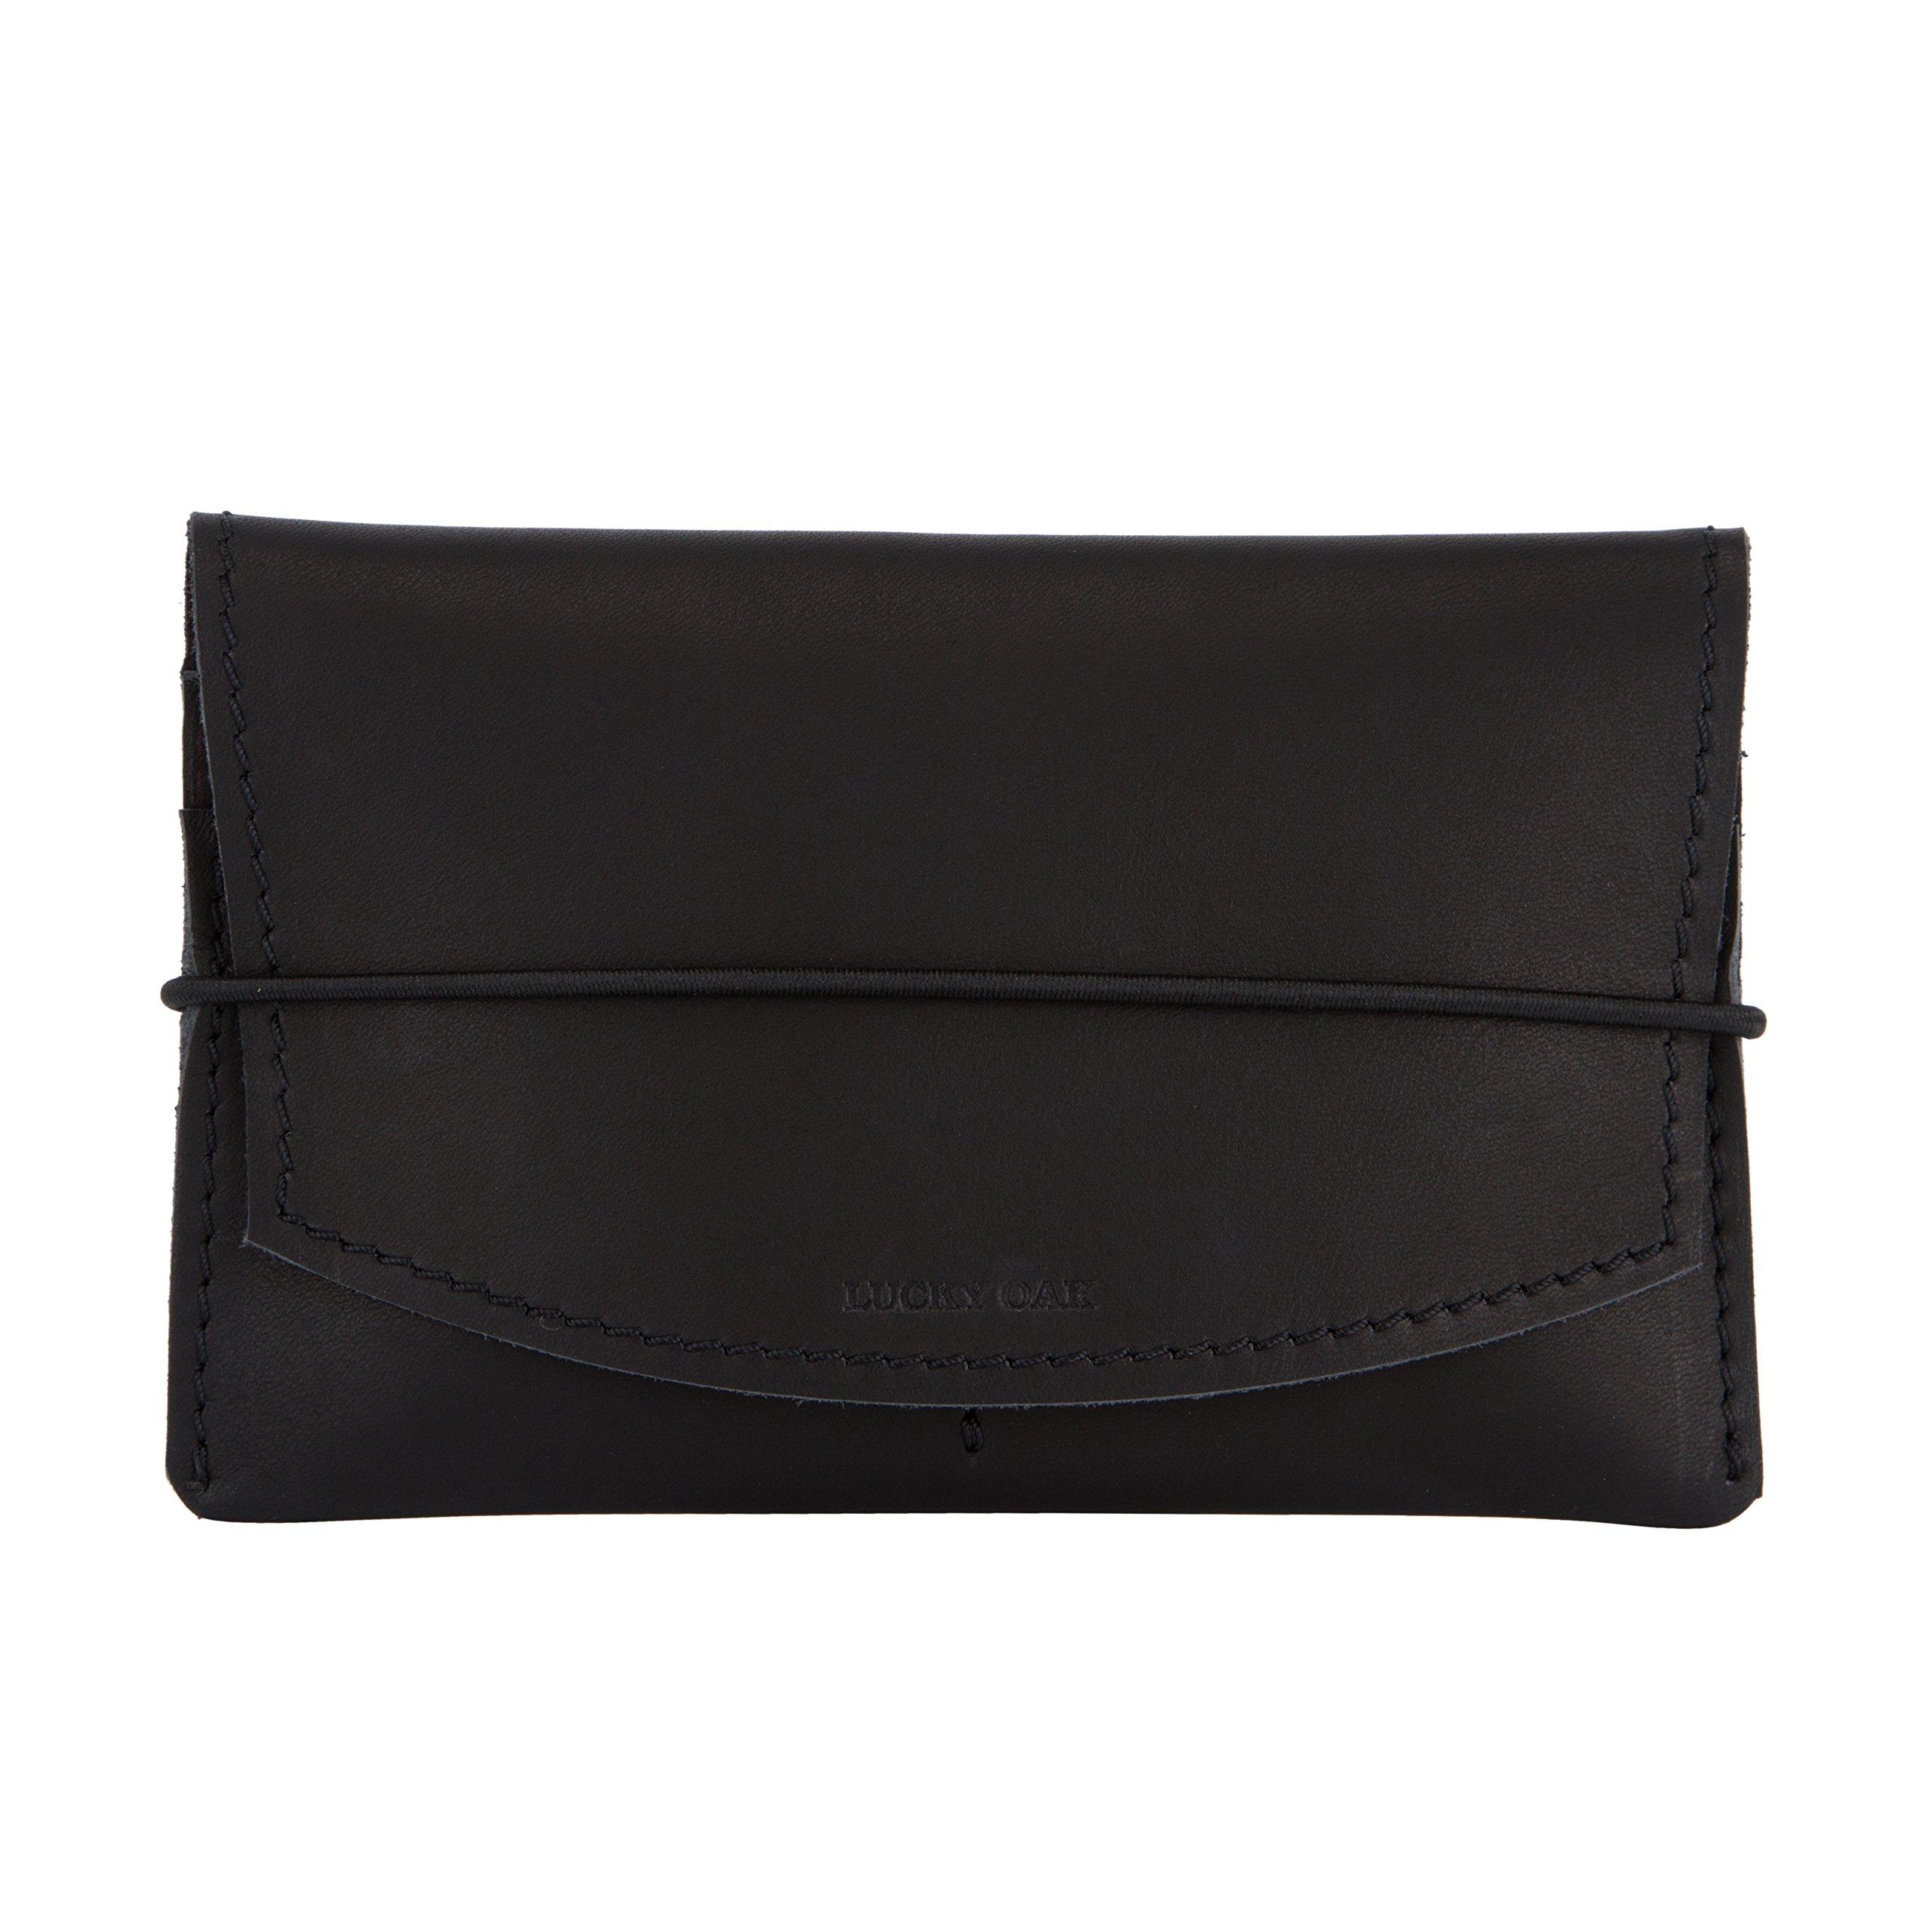 Leather Passport Holder – Travel Wallet Cover Case for Men & Women (organizer, black vintage)